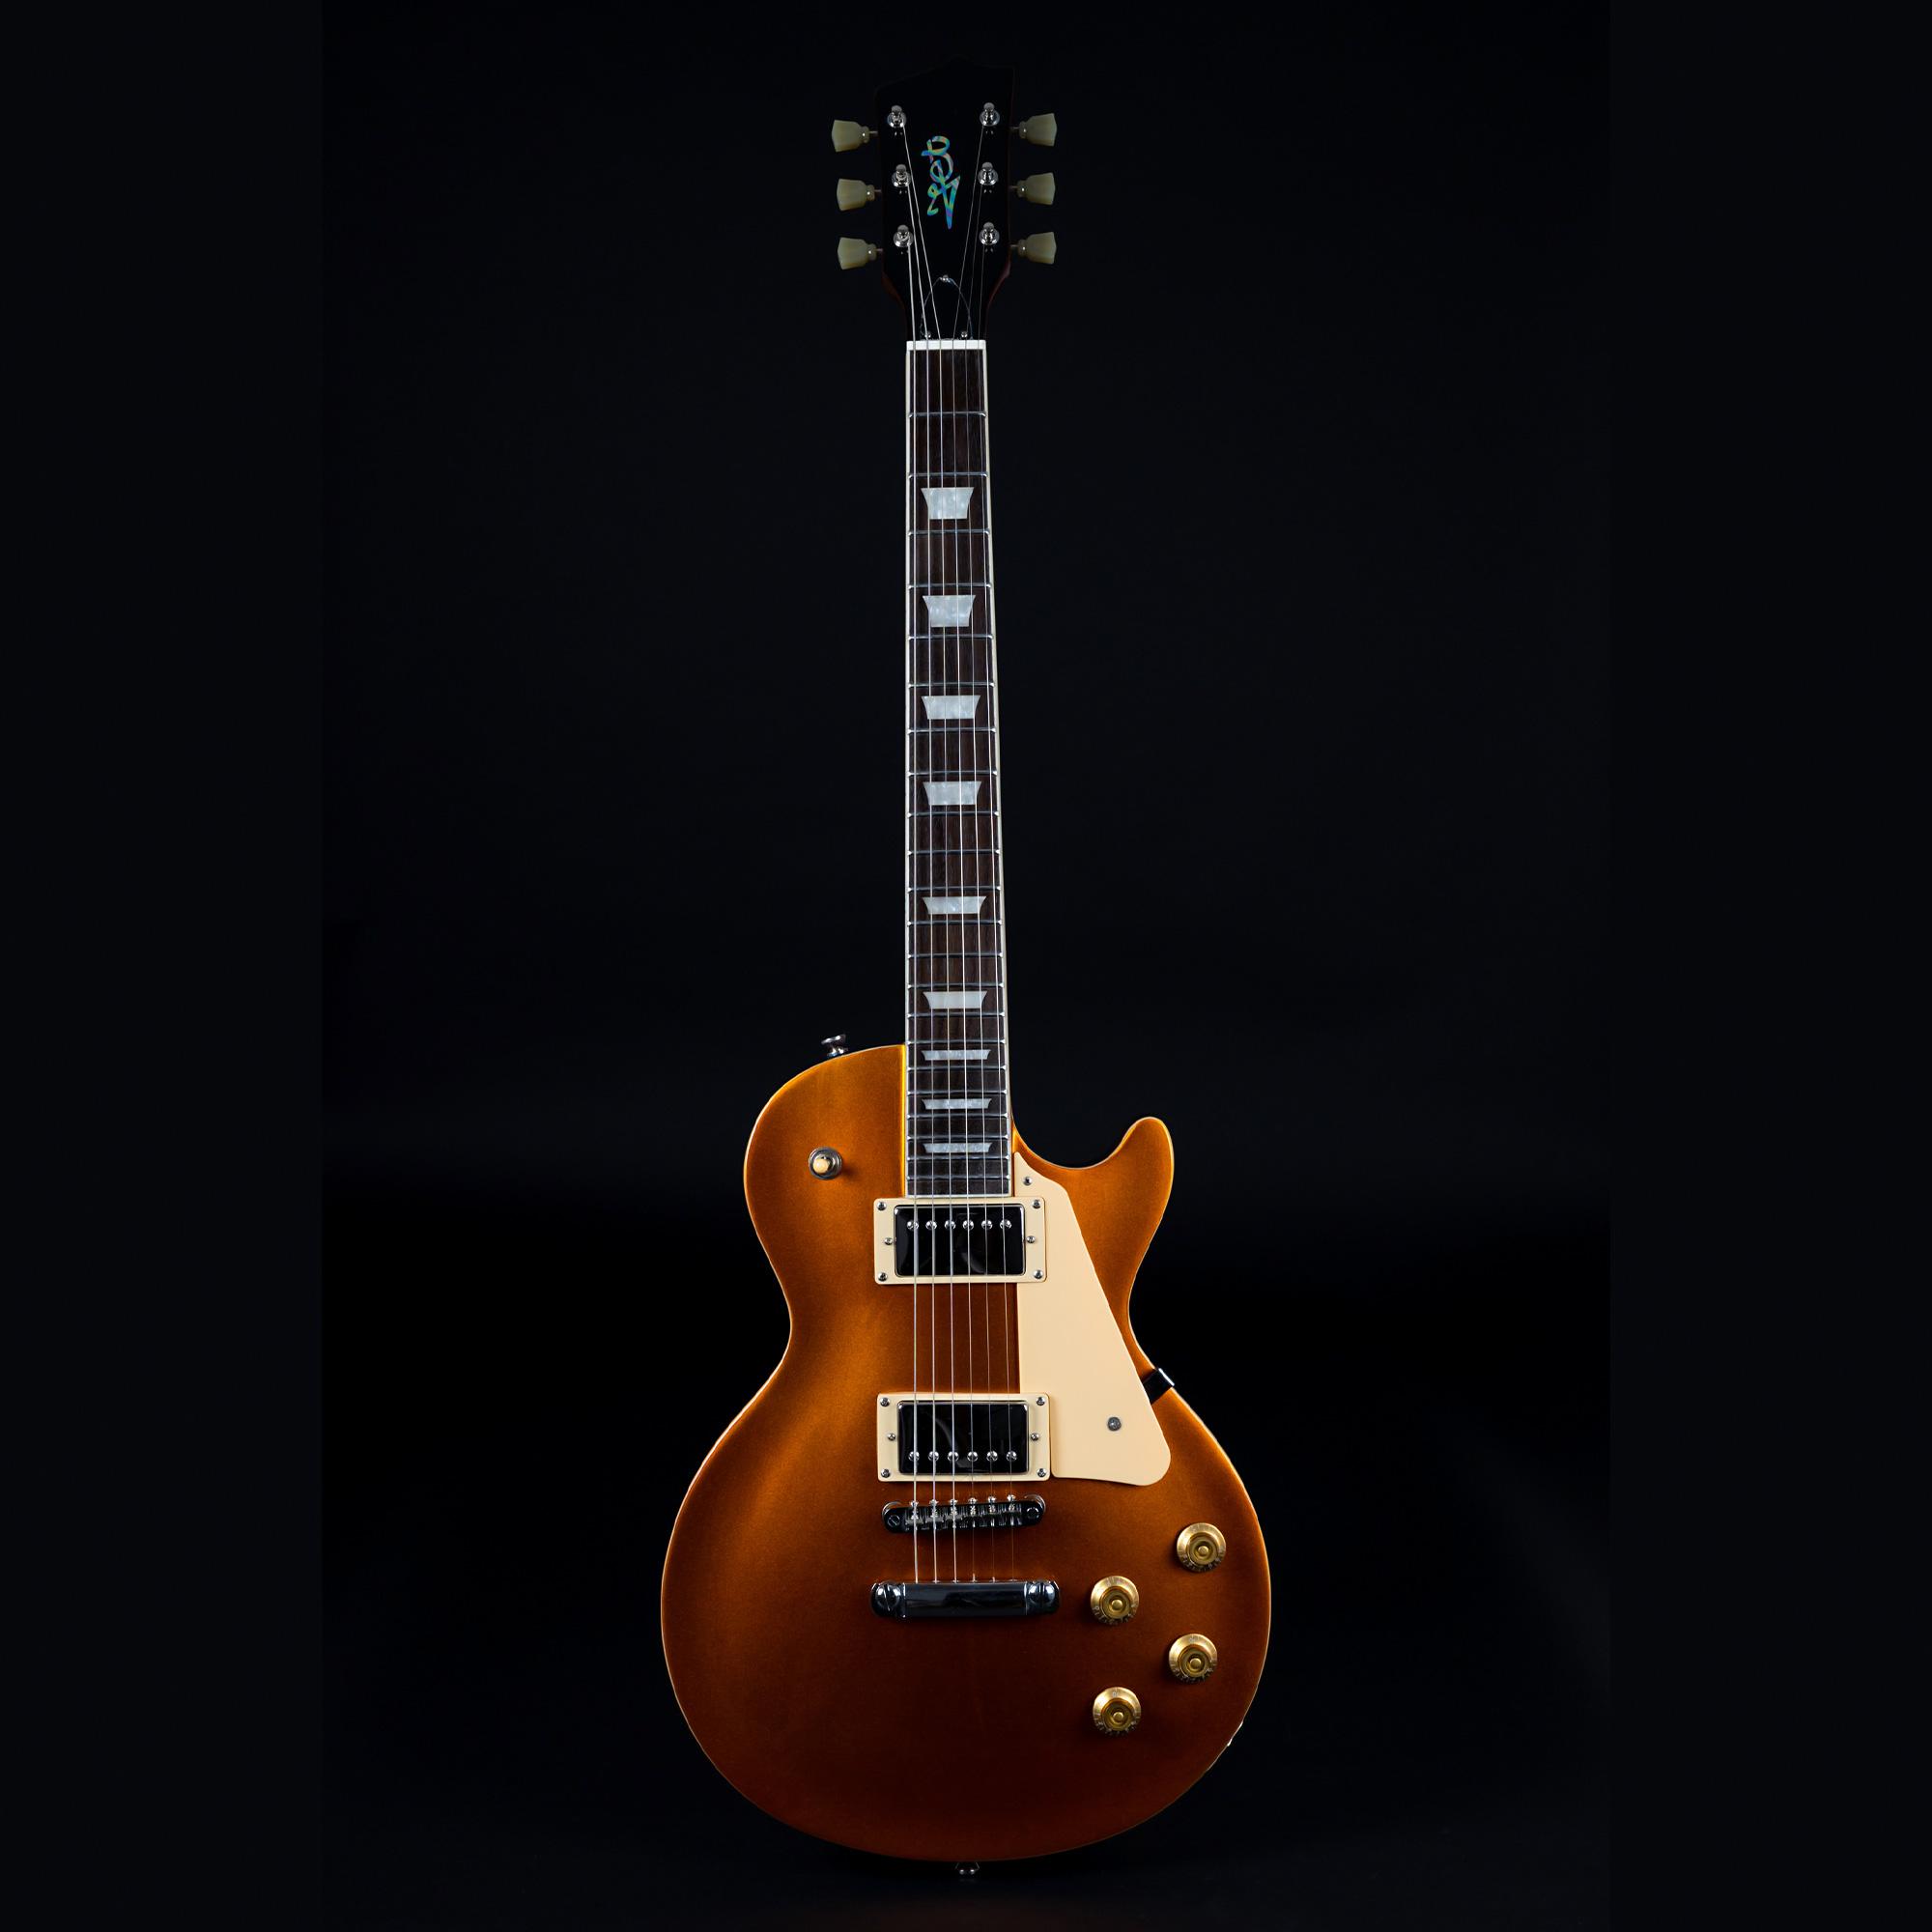 JET Guitars - JL 500 Series